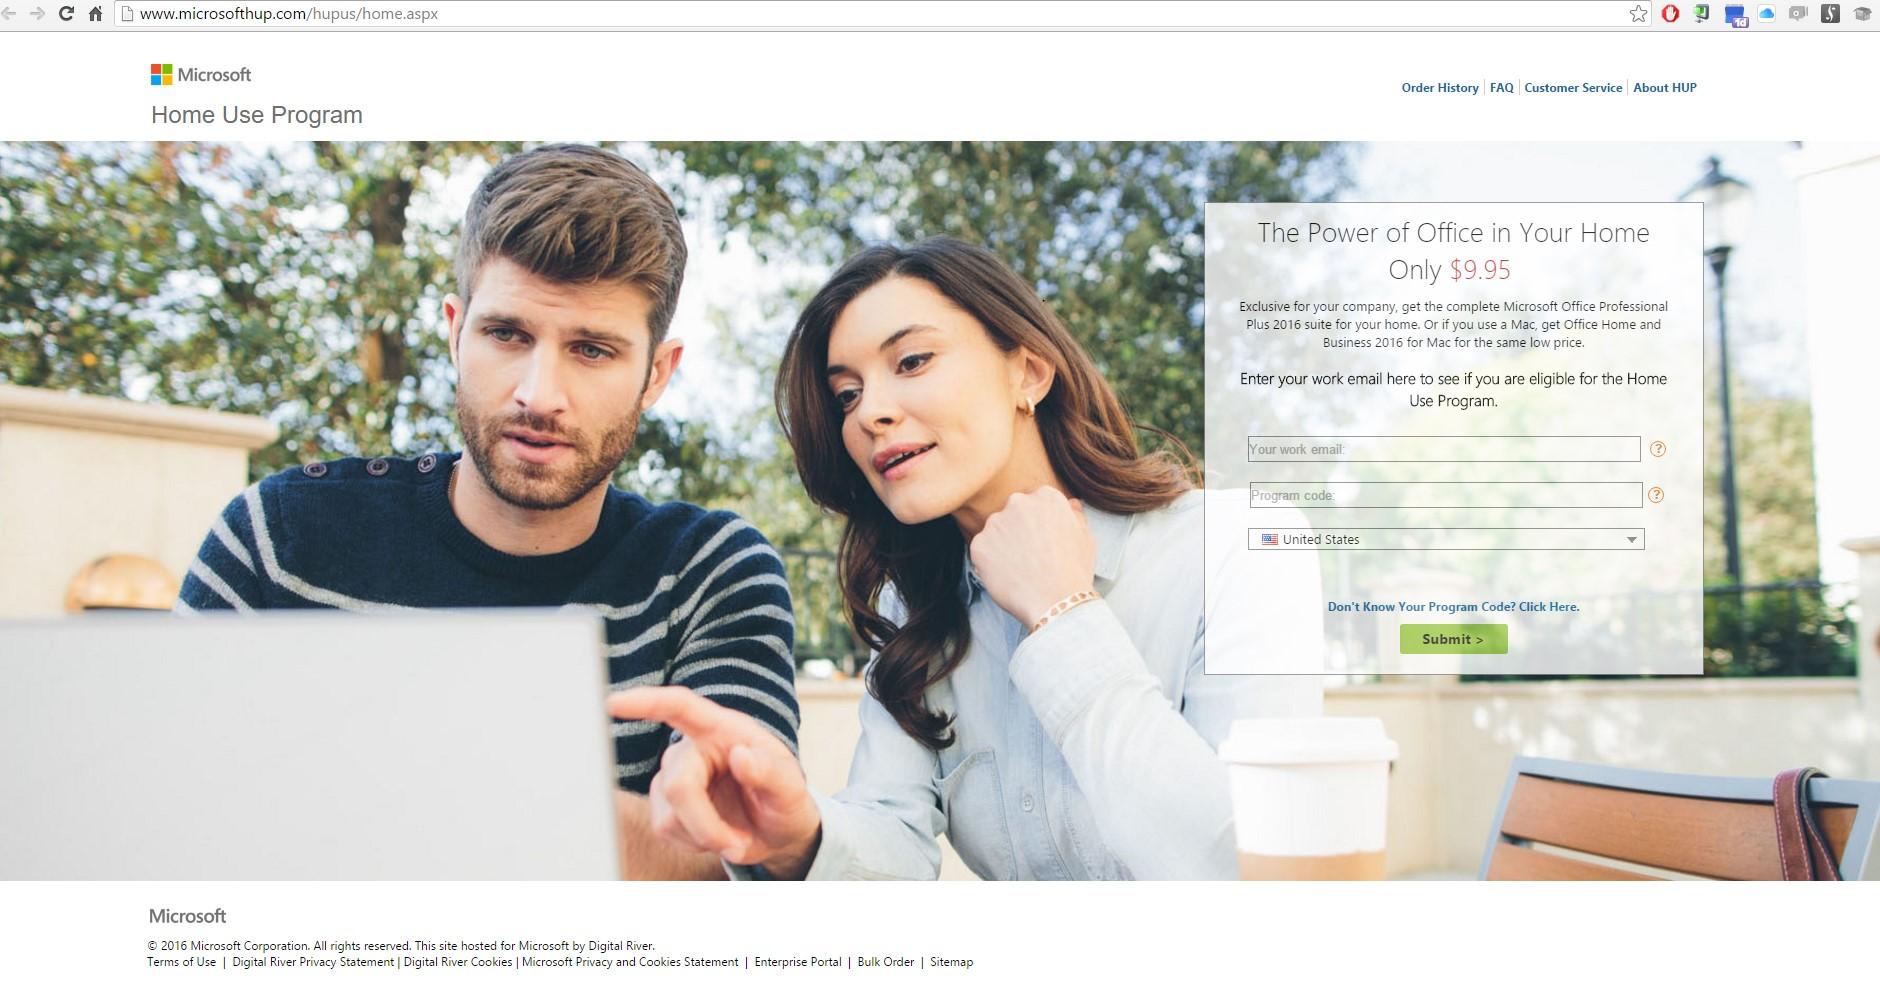 Microsoft Home Use Program – FirstFleet Support